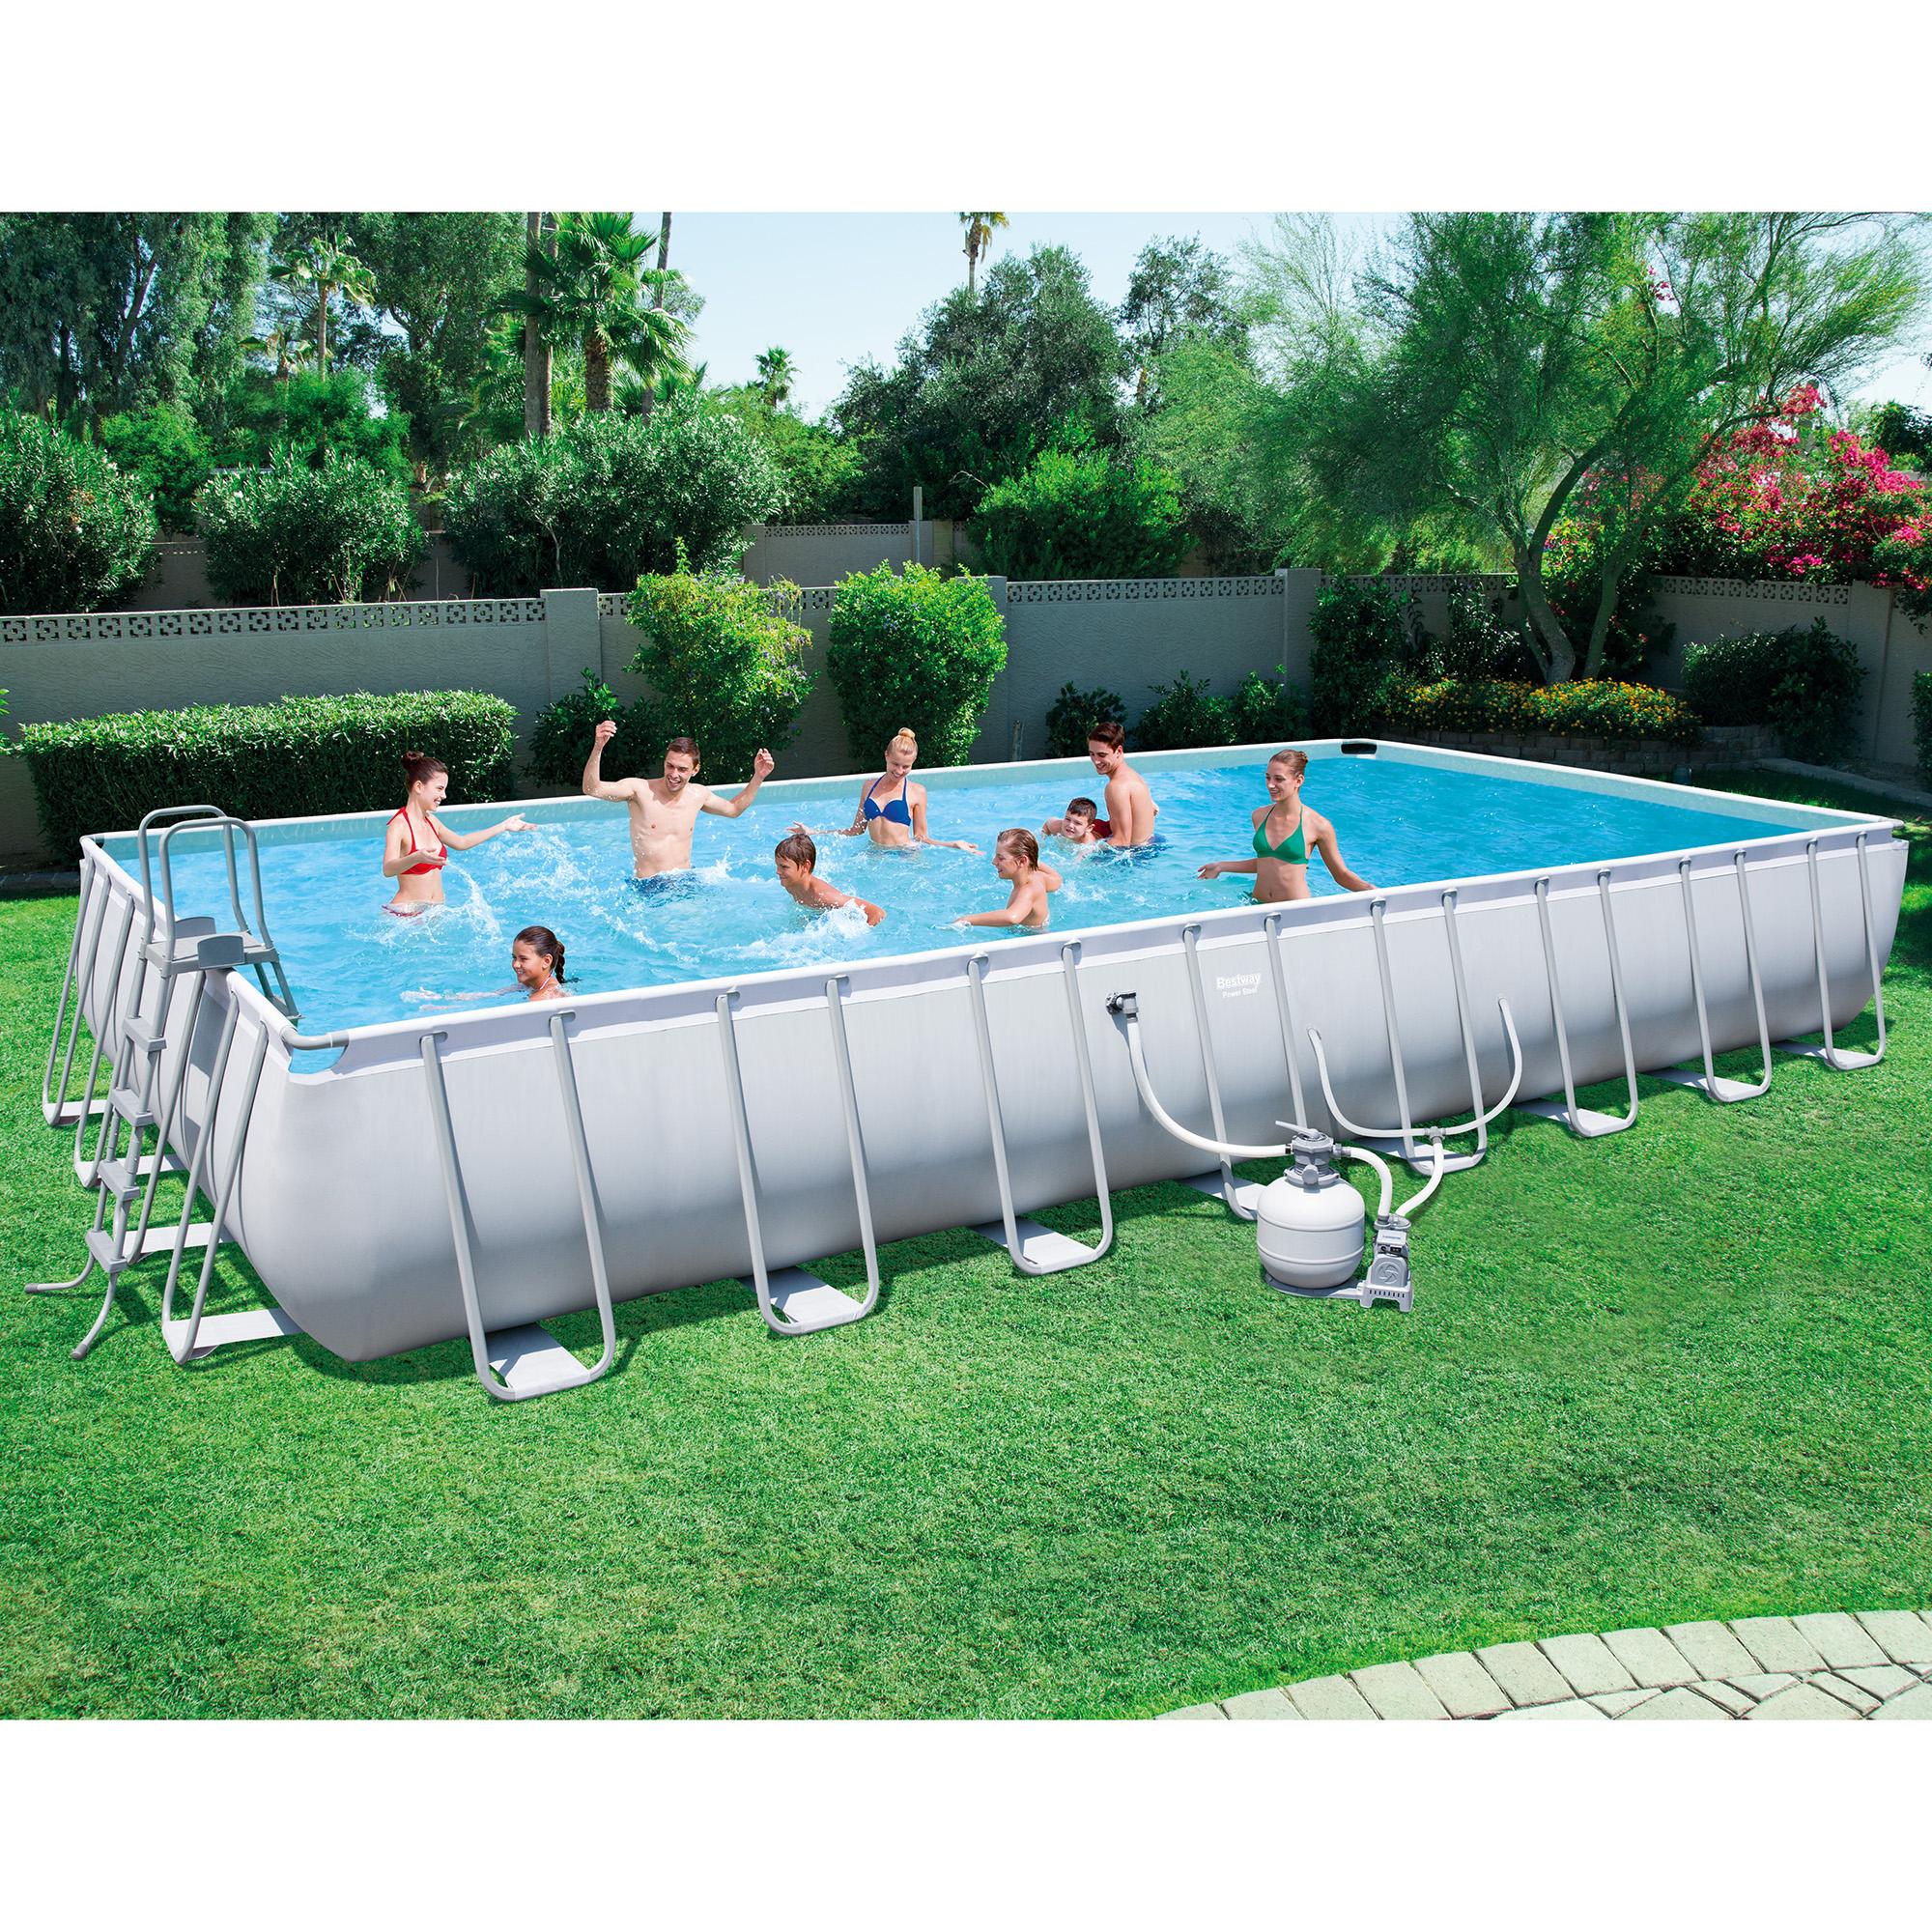 bestway 313x16x52 rectangular frame above ground pool set with ladder pump